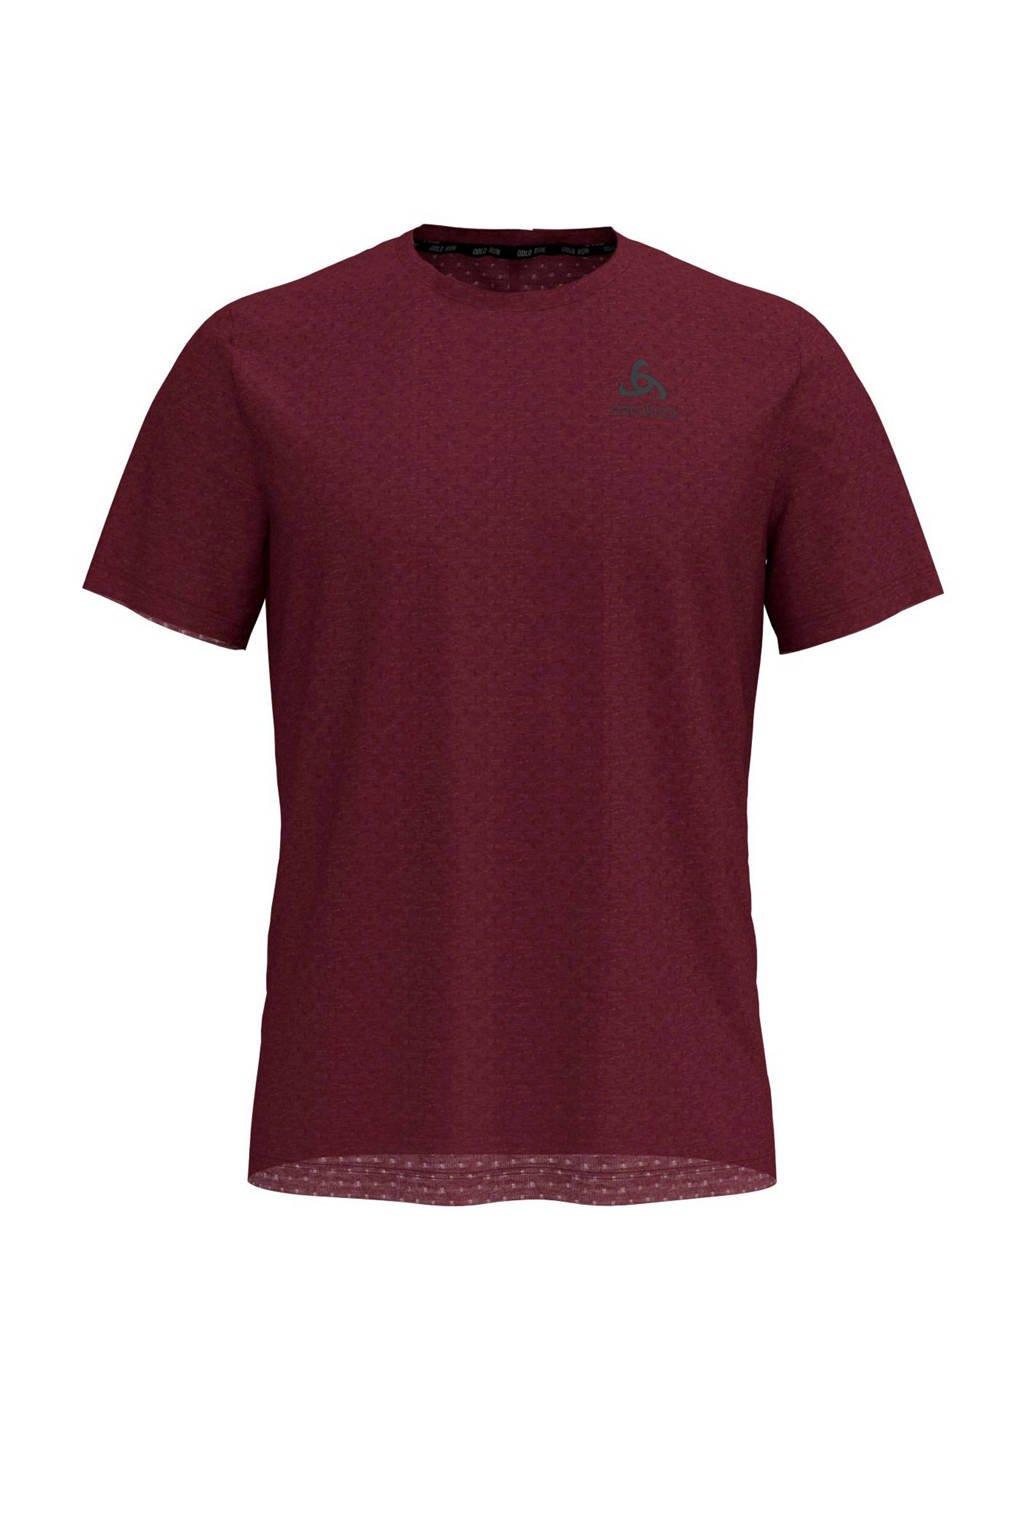 Odlo   hardloop T-shirt donkerrood, Donkerrood